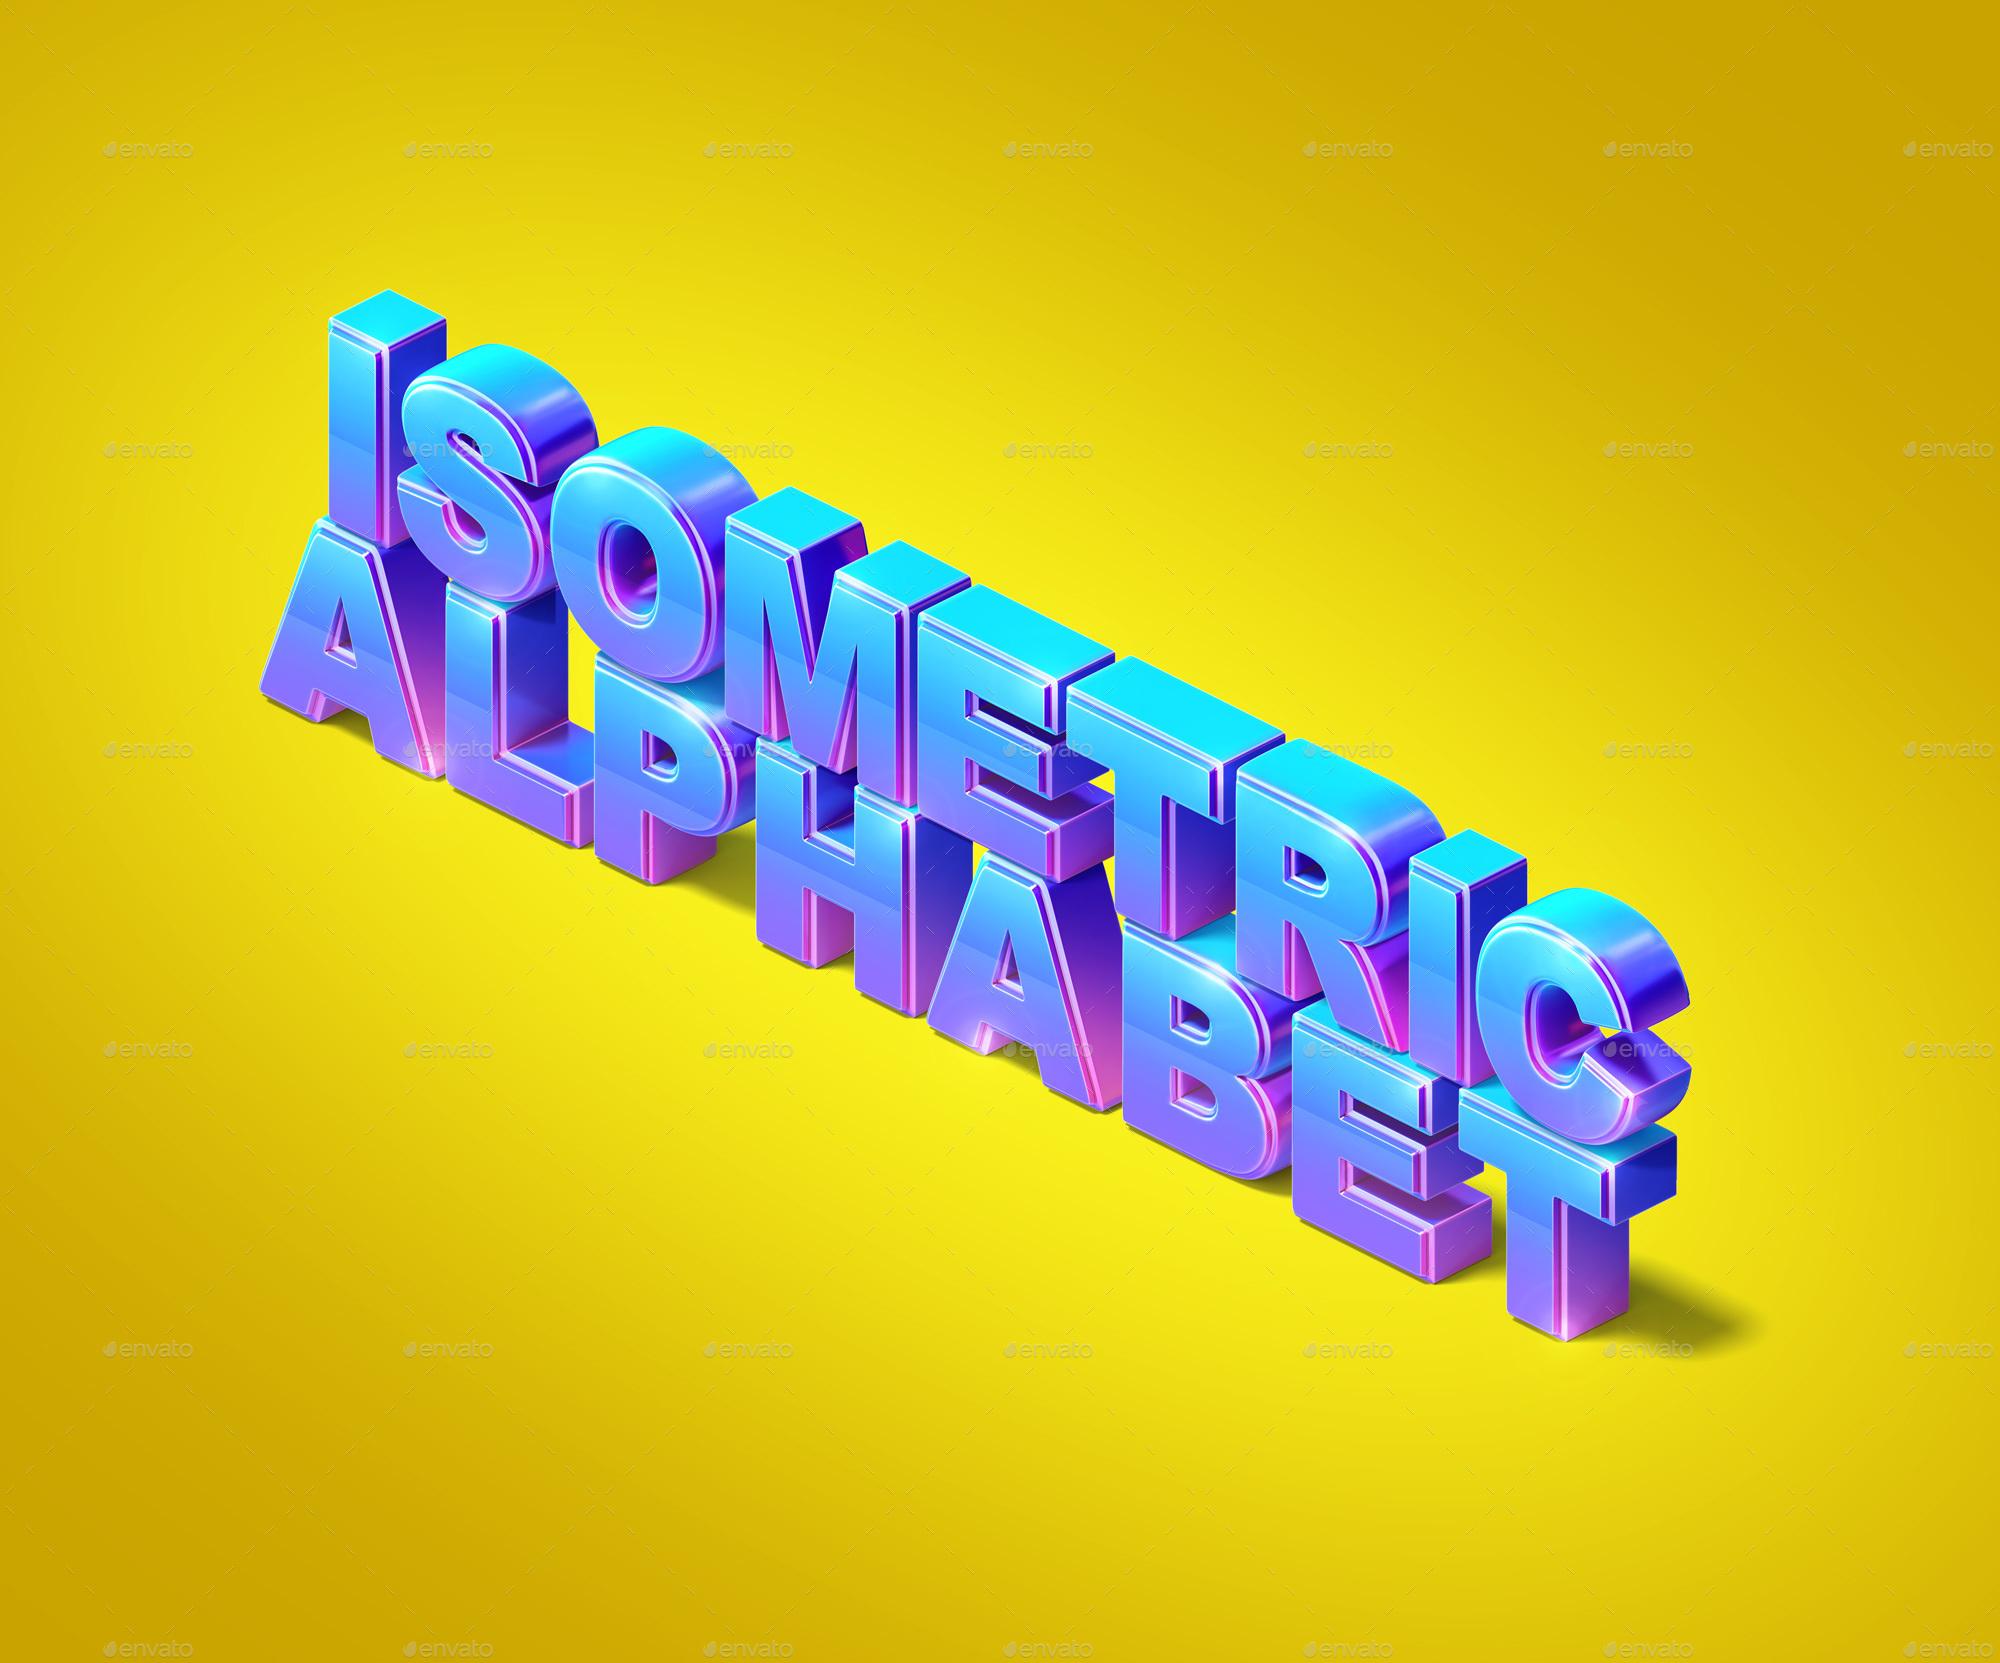 Isometric 3D Text